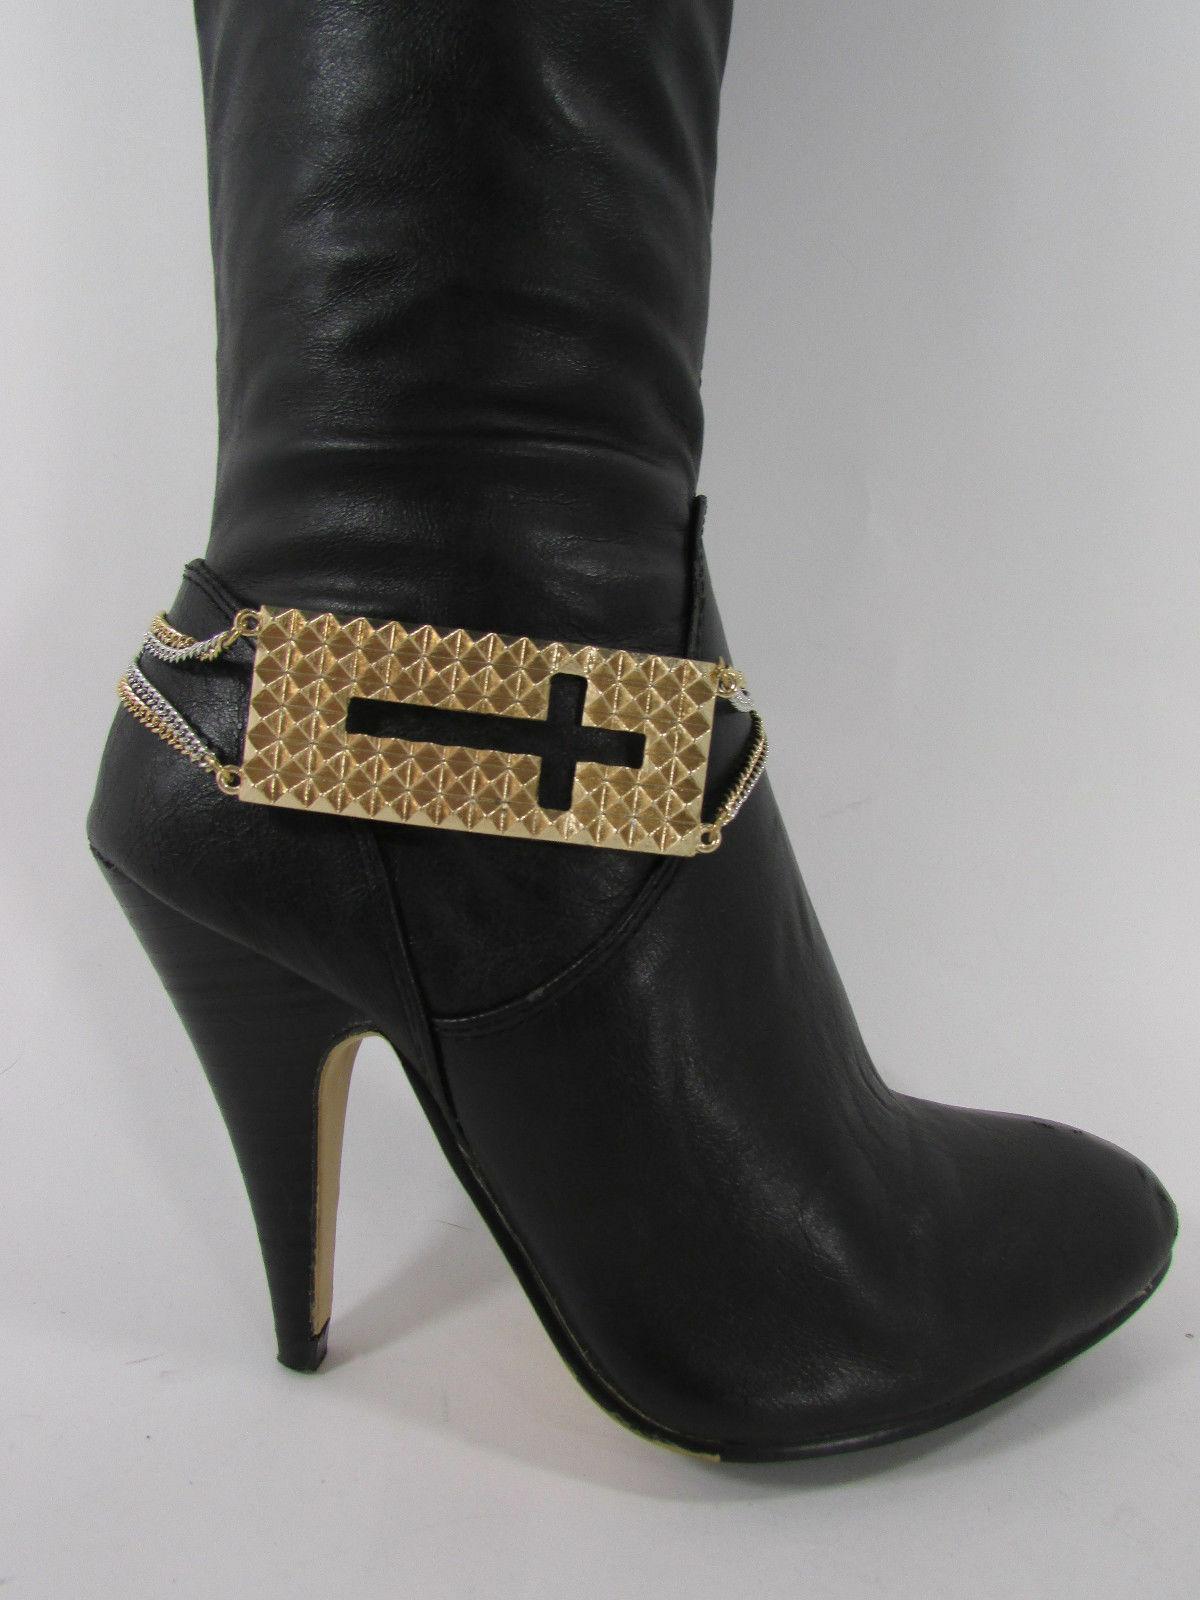 Mujer Moda Joyería Bota Brazalete Oro Placa Cruz Cadenas Zapato Bling Charm image 2